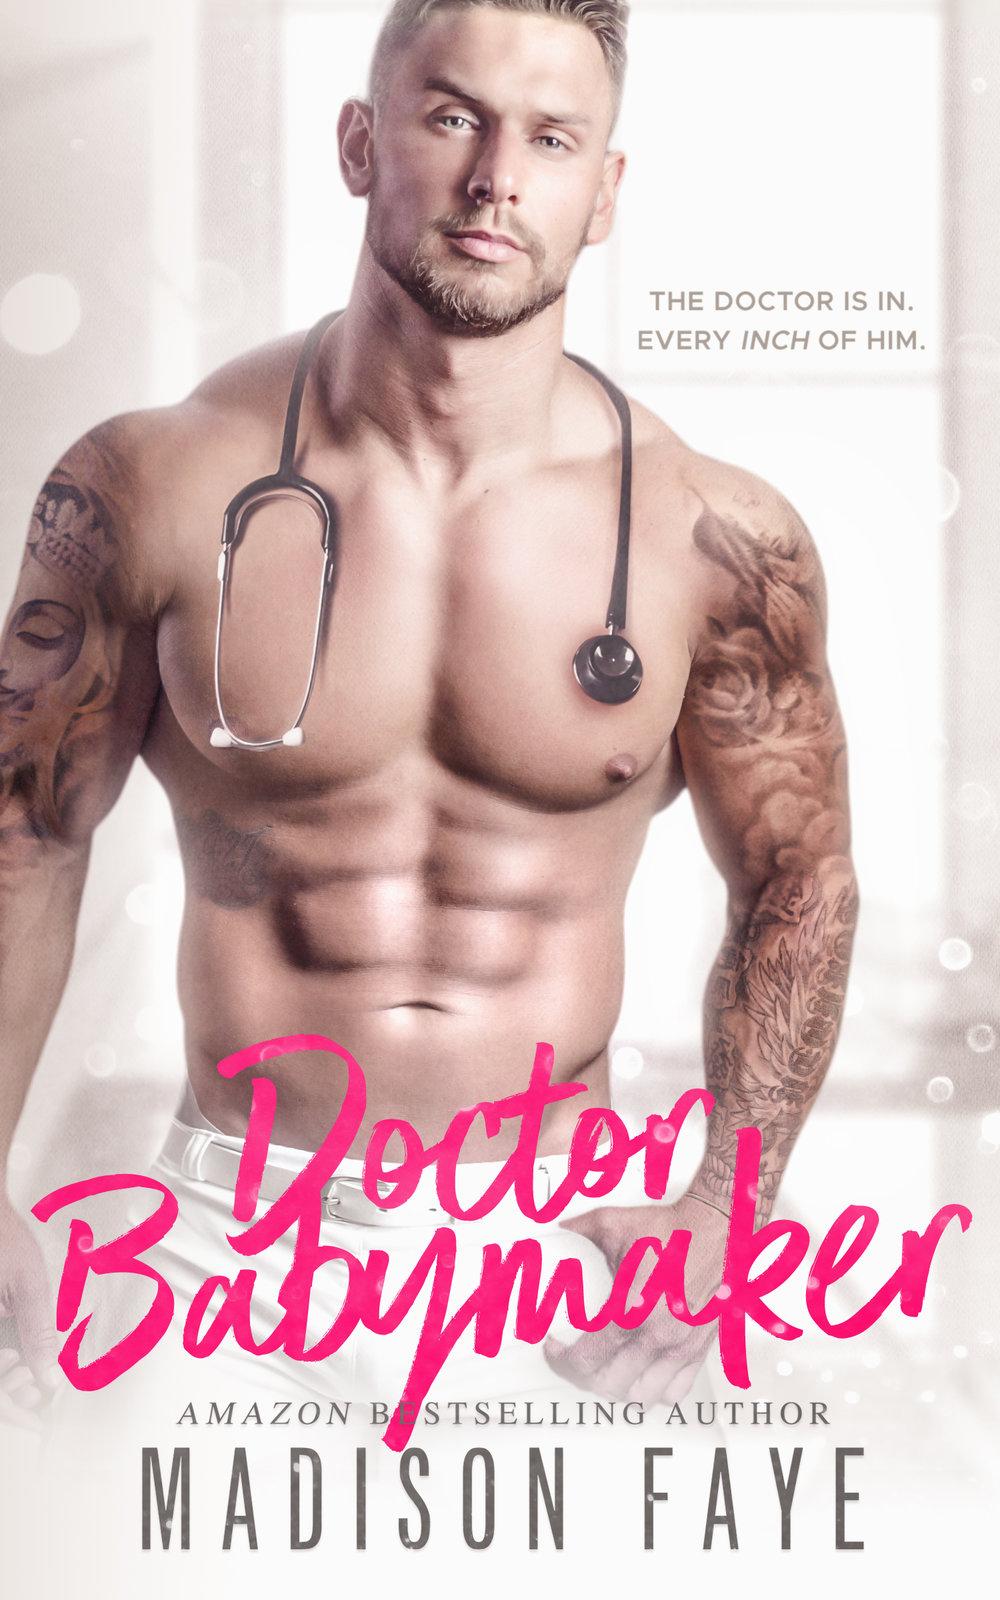 DoctorBabymaker.jpg